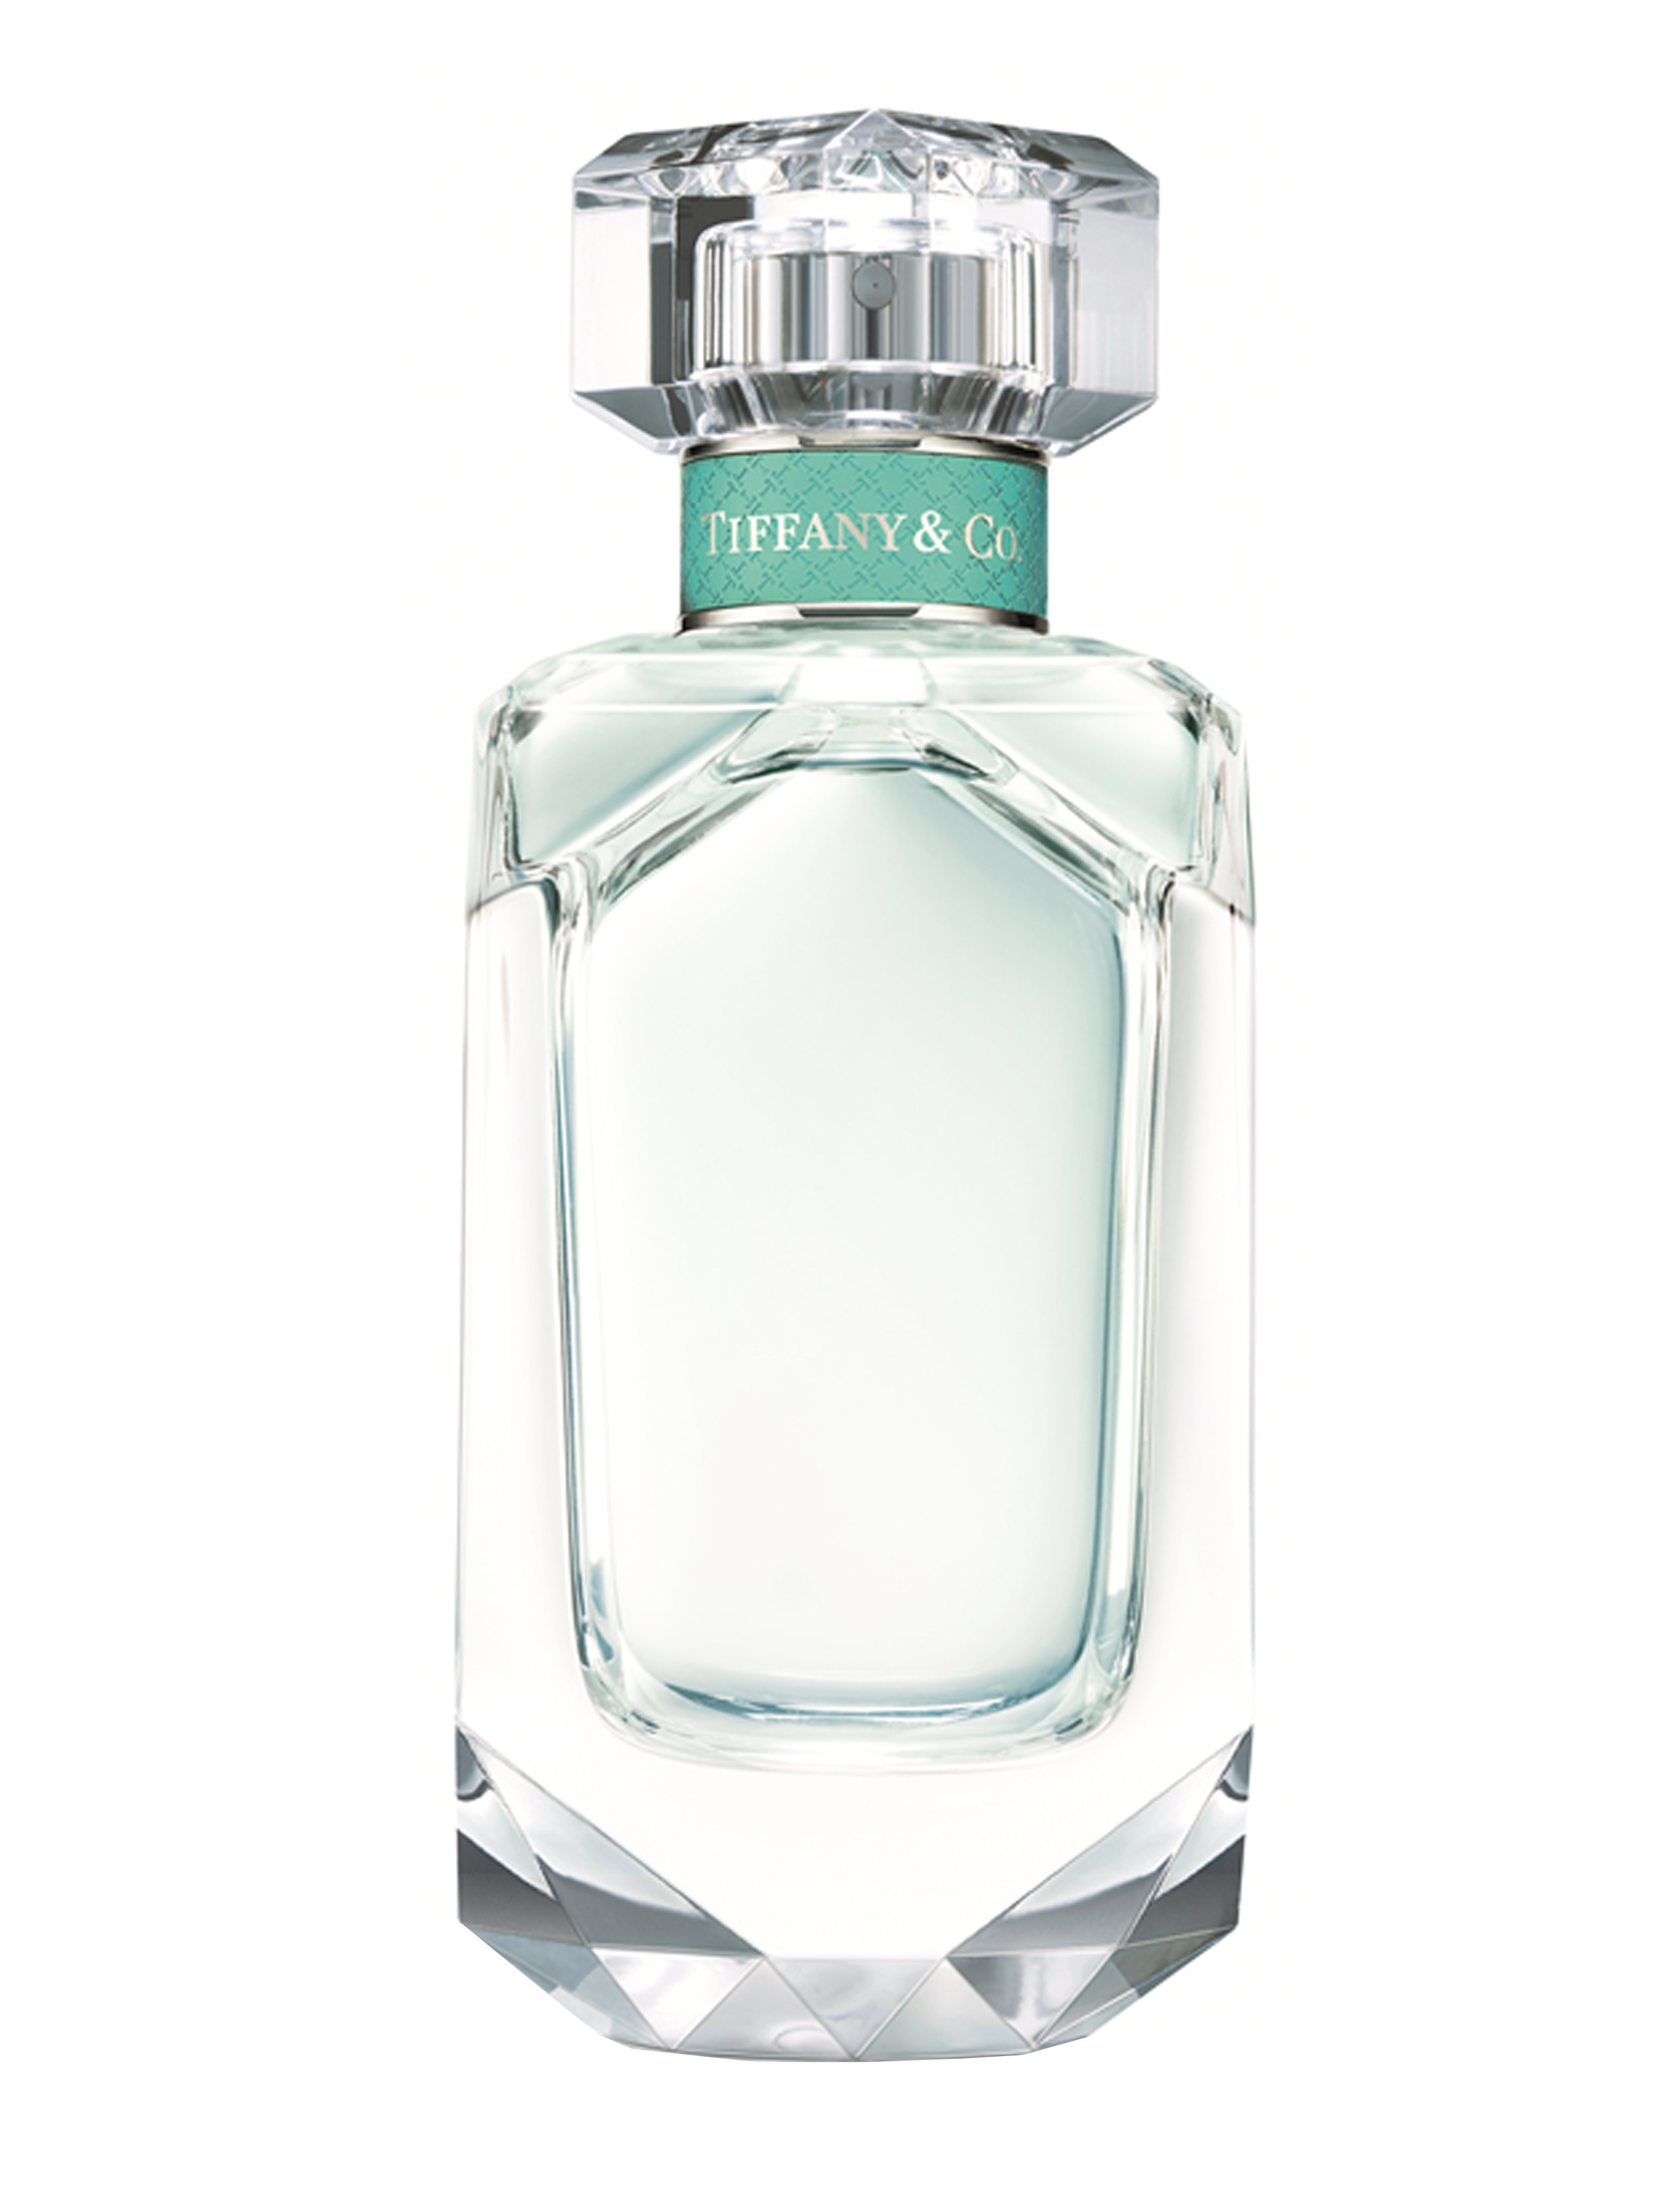 Tiffany & Co. - Eau De Parfum 75 ml